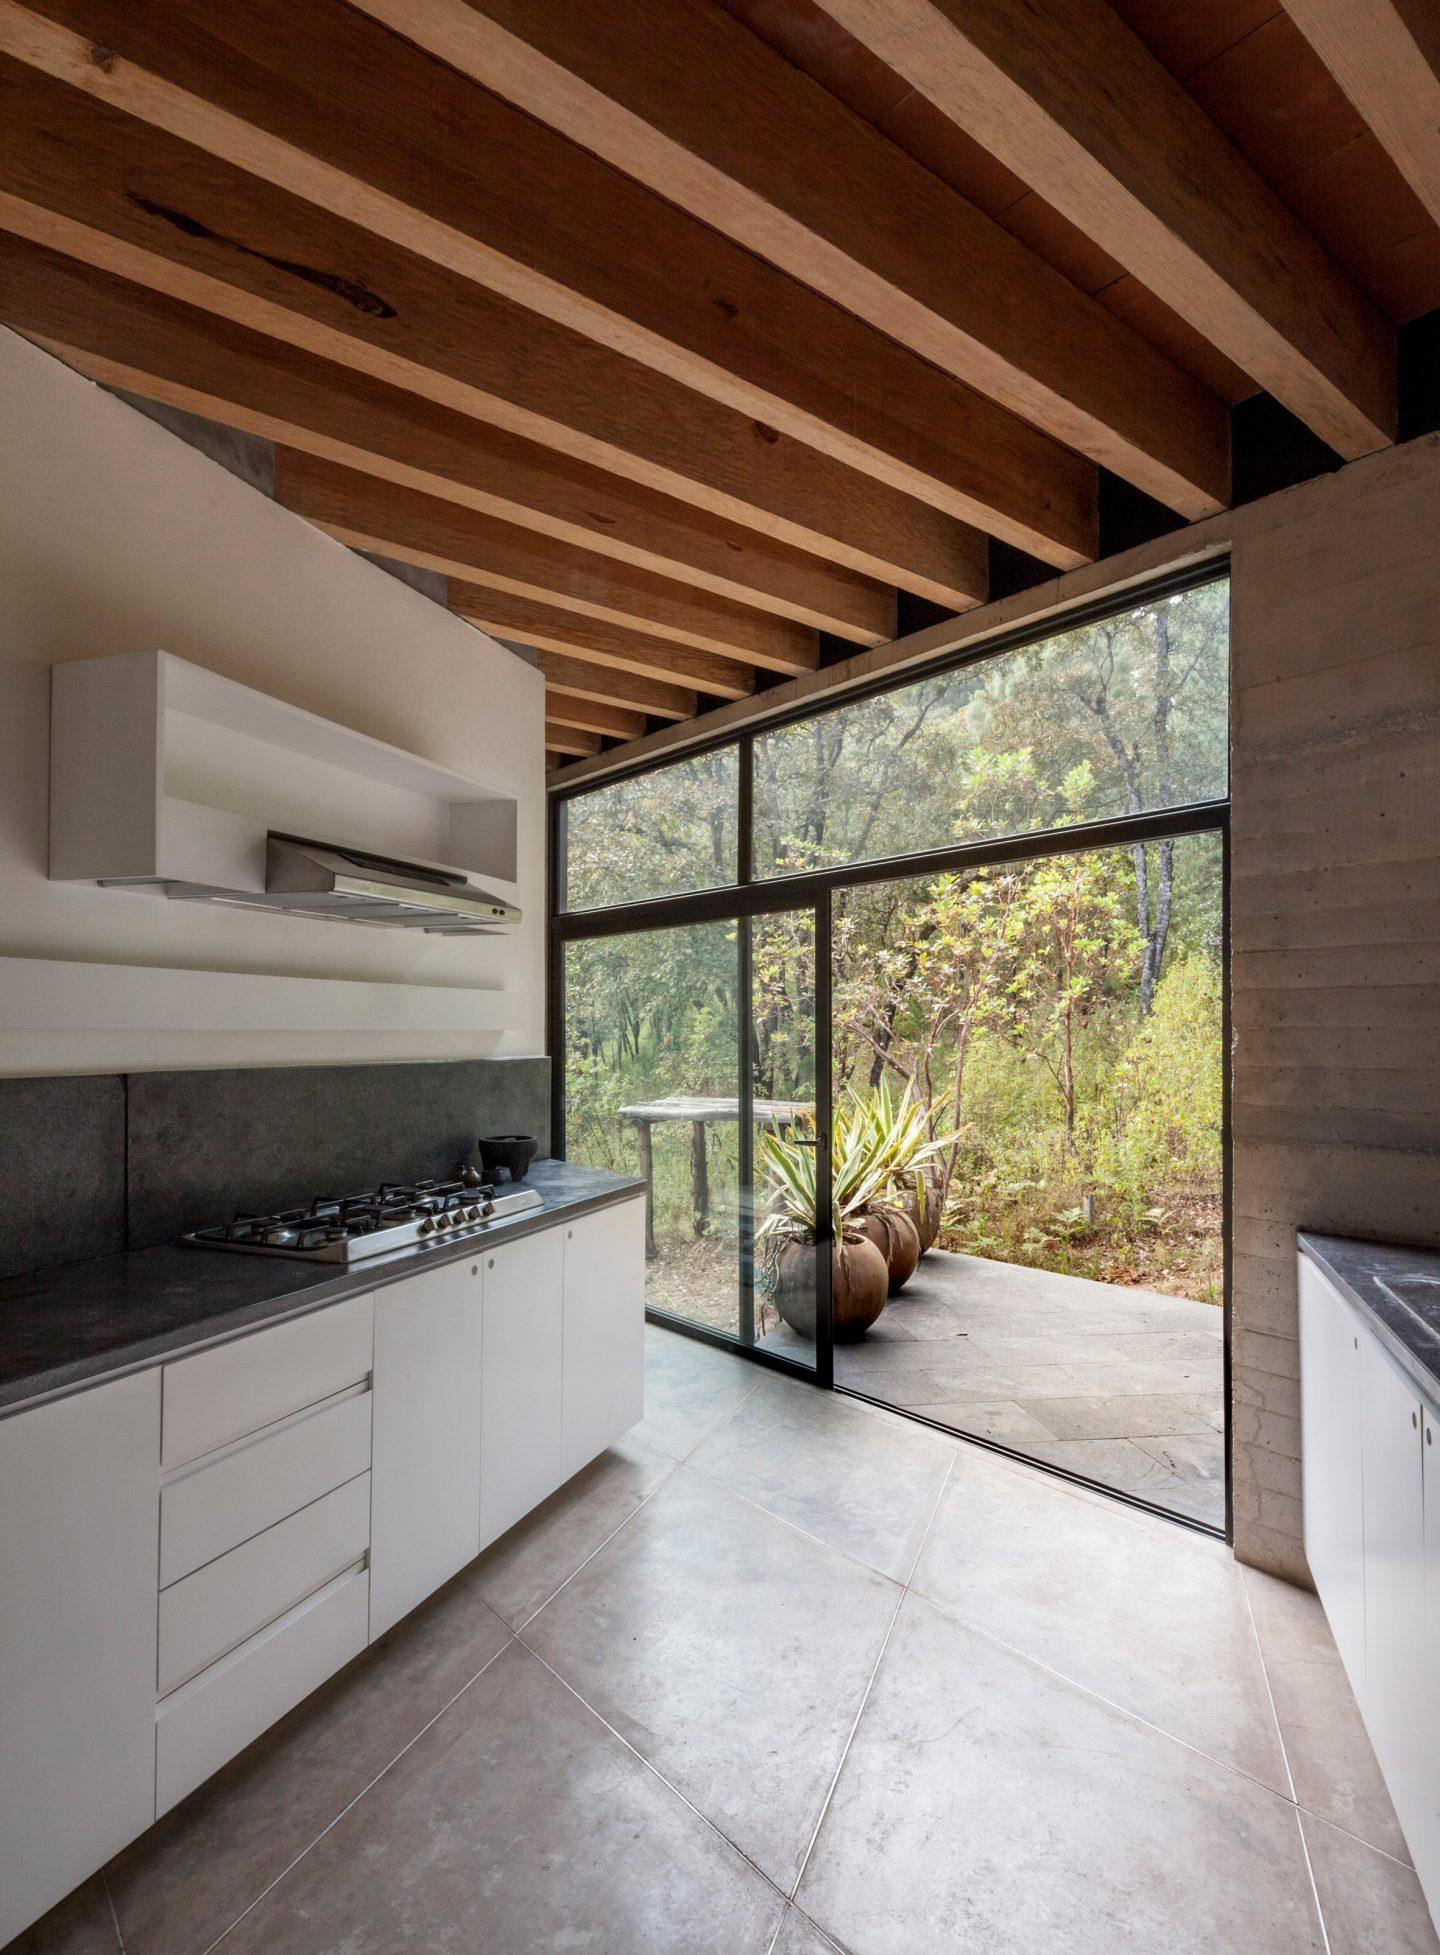 IGNANT-Architecture-Cadaval-Sola-Morales-Casa-De-La-Roca-5